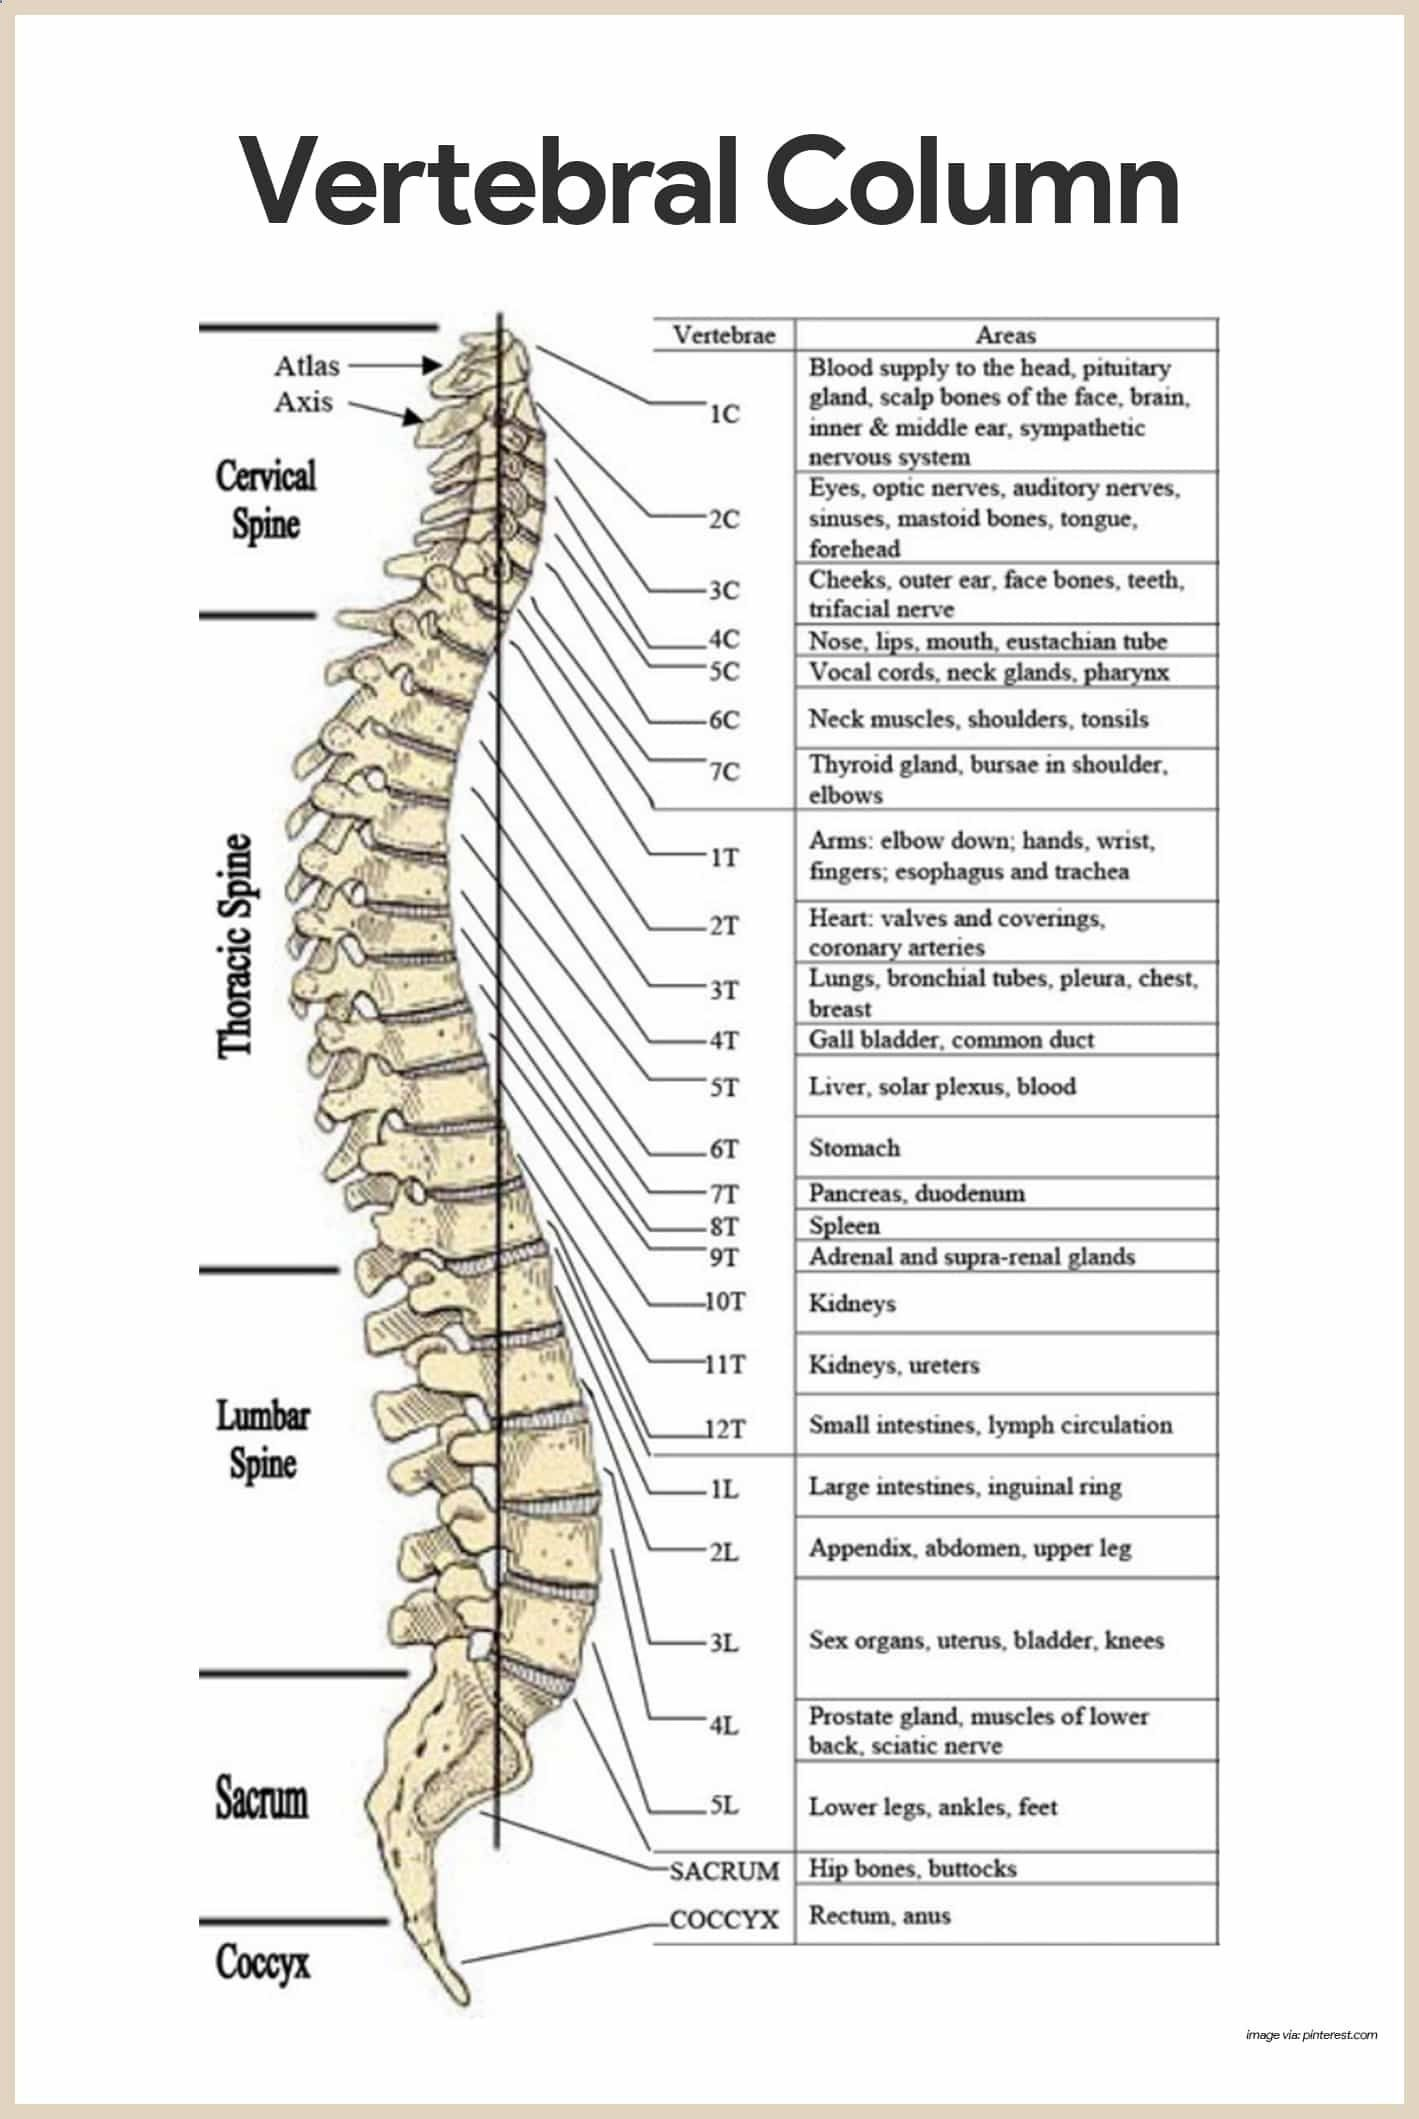 Vertebral Column Skeletal System Anatomy And Physiology